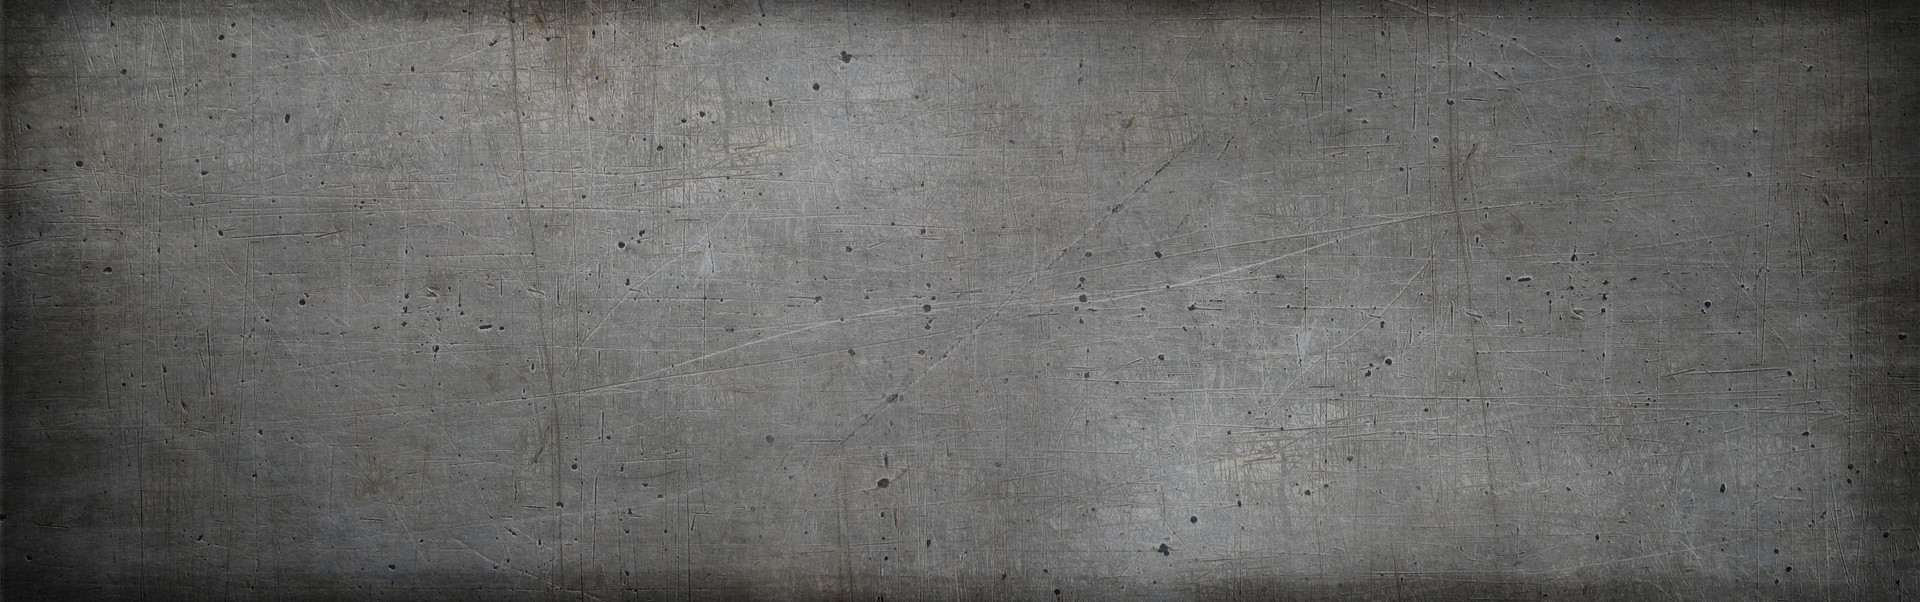 composite dark3.jpg